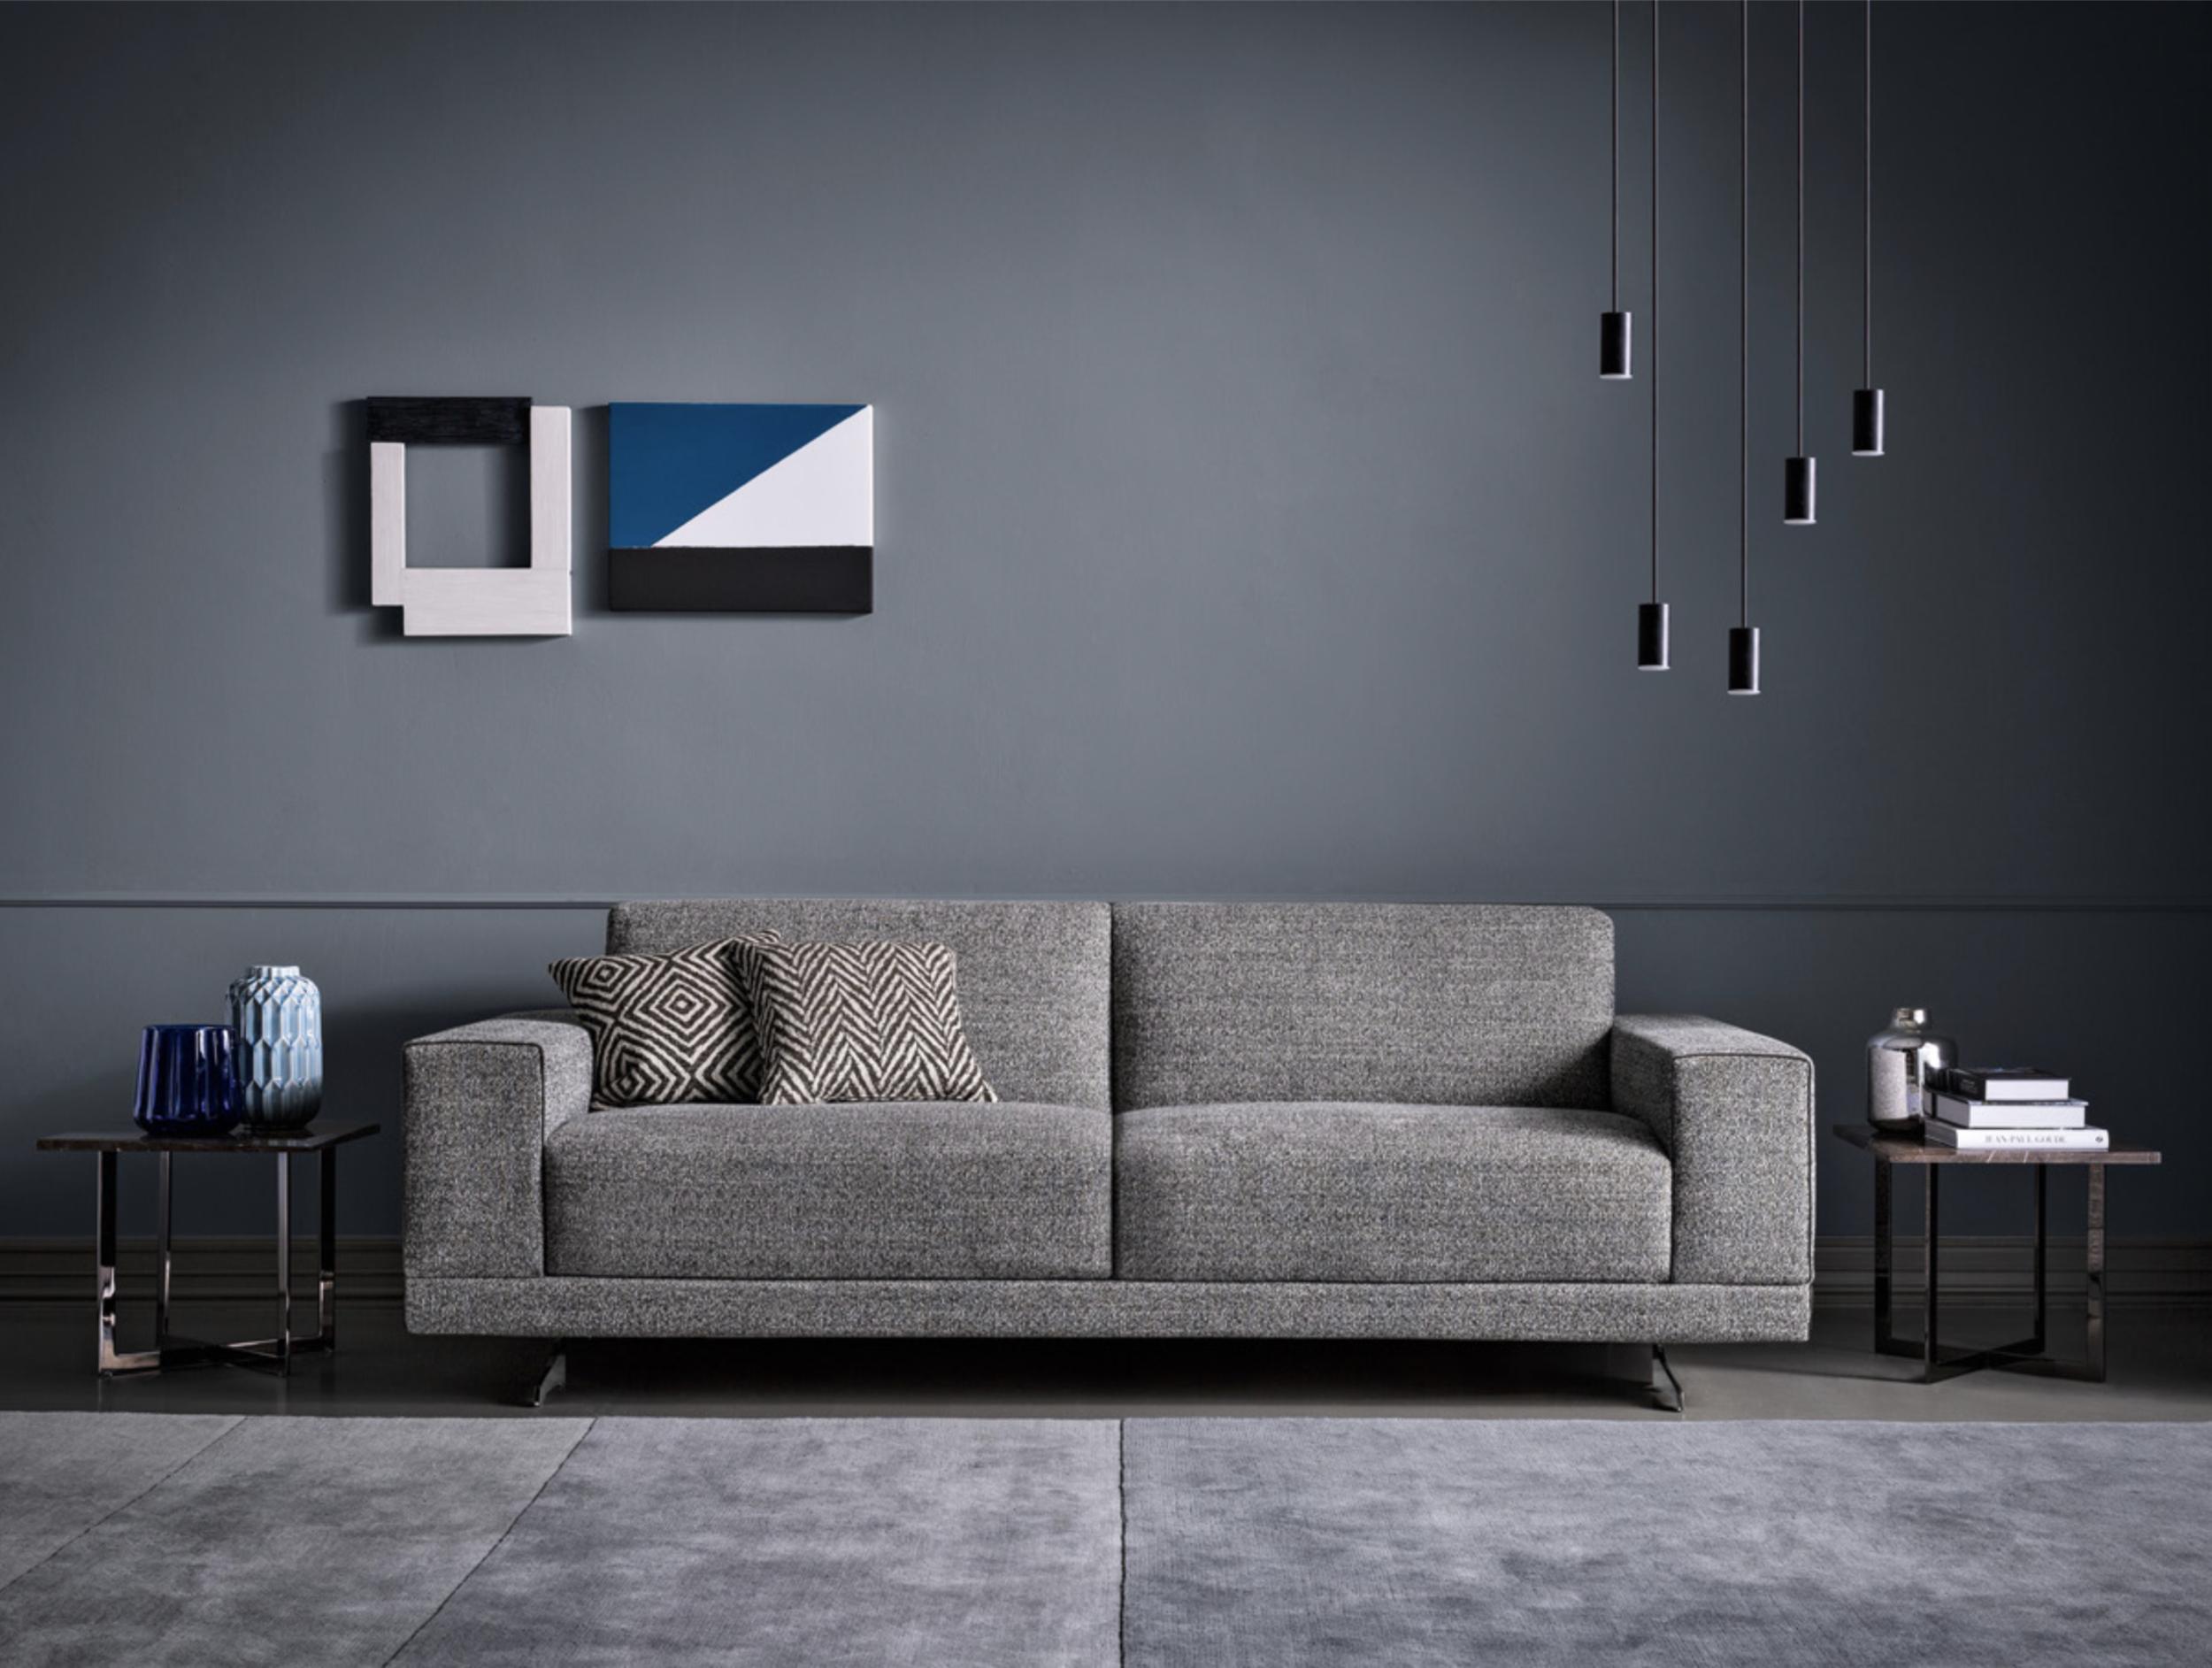 SBD 124 Modern Sofa Beds — Modern Italian Designer Furniture ...